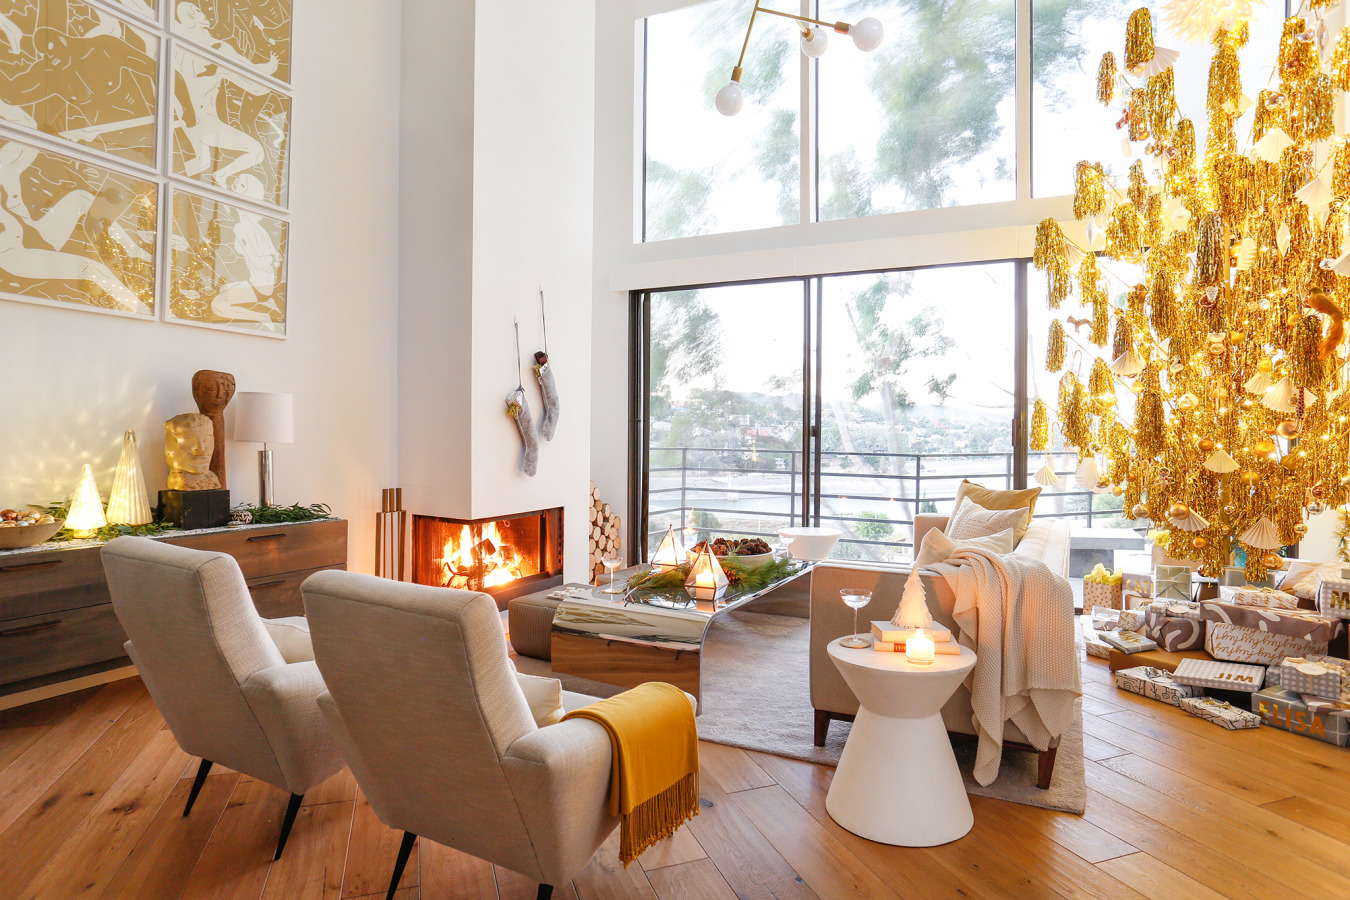 Homepolish-interior-design-676d1-1350x900 (1)